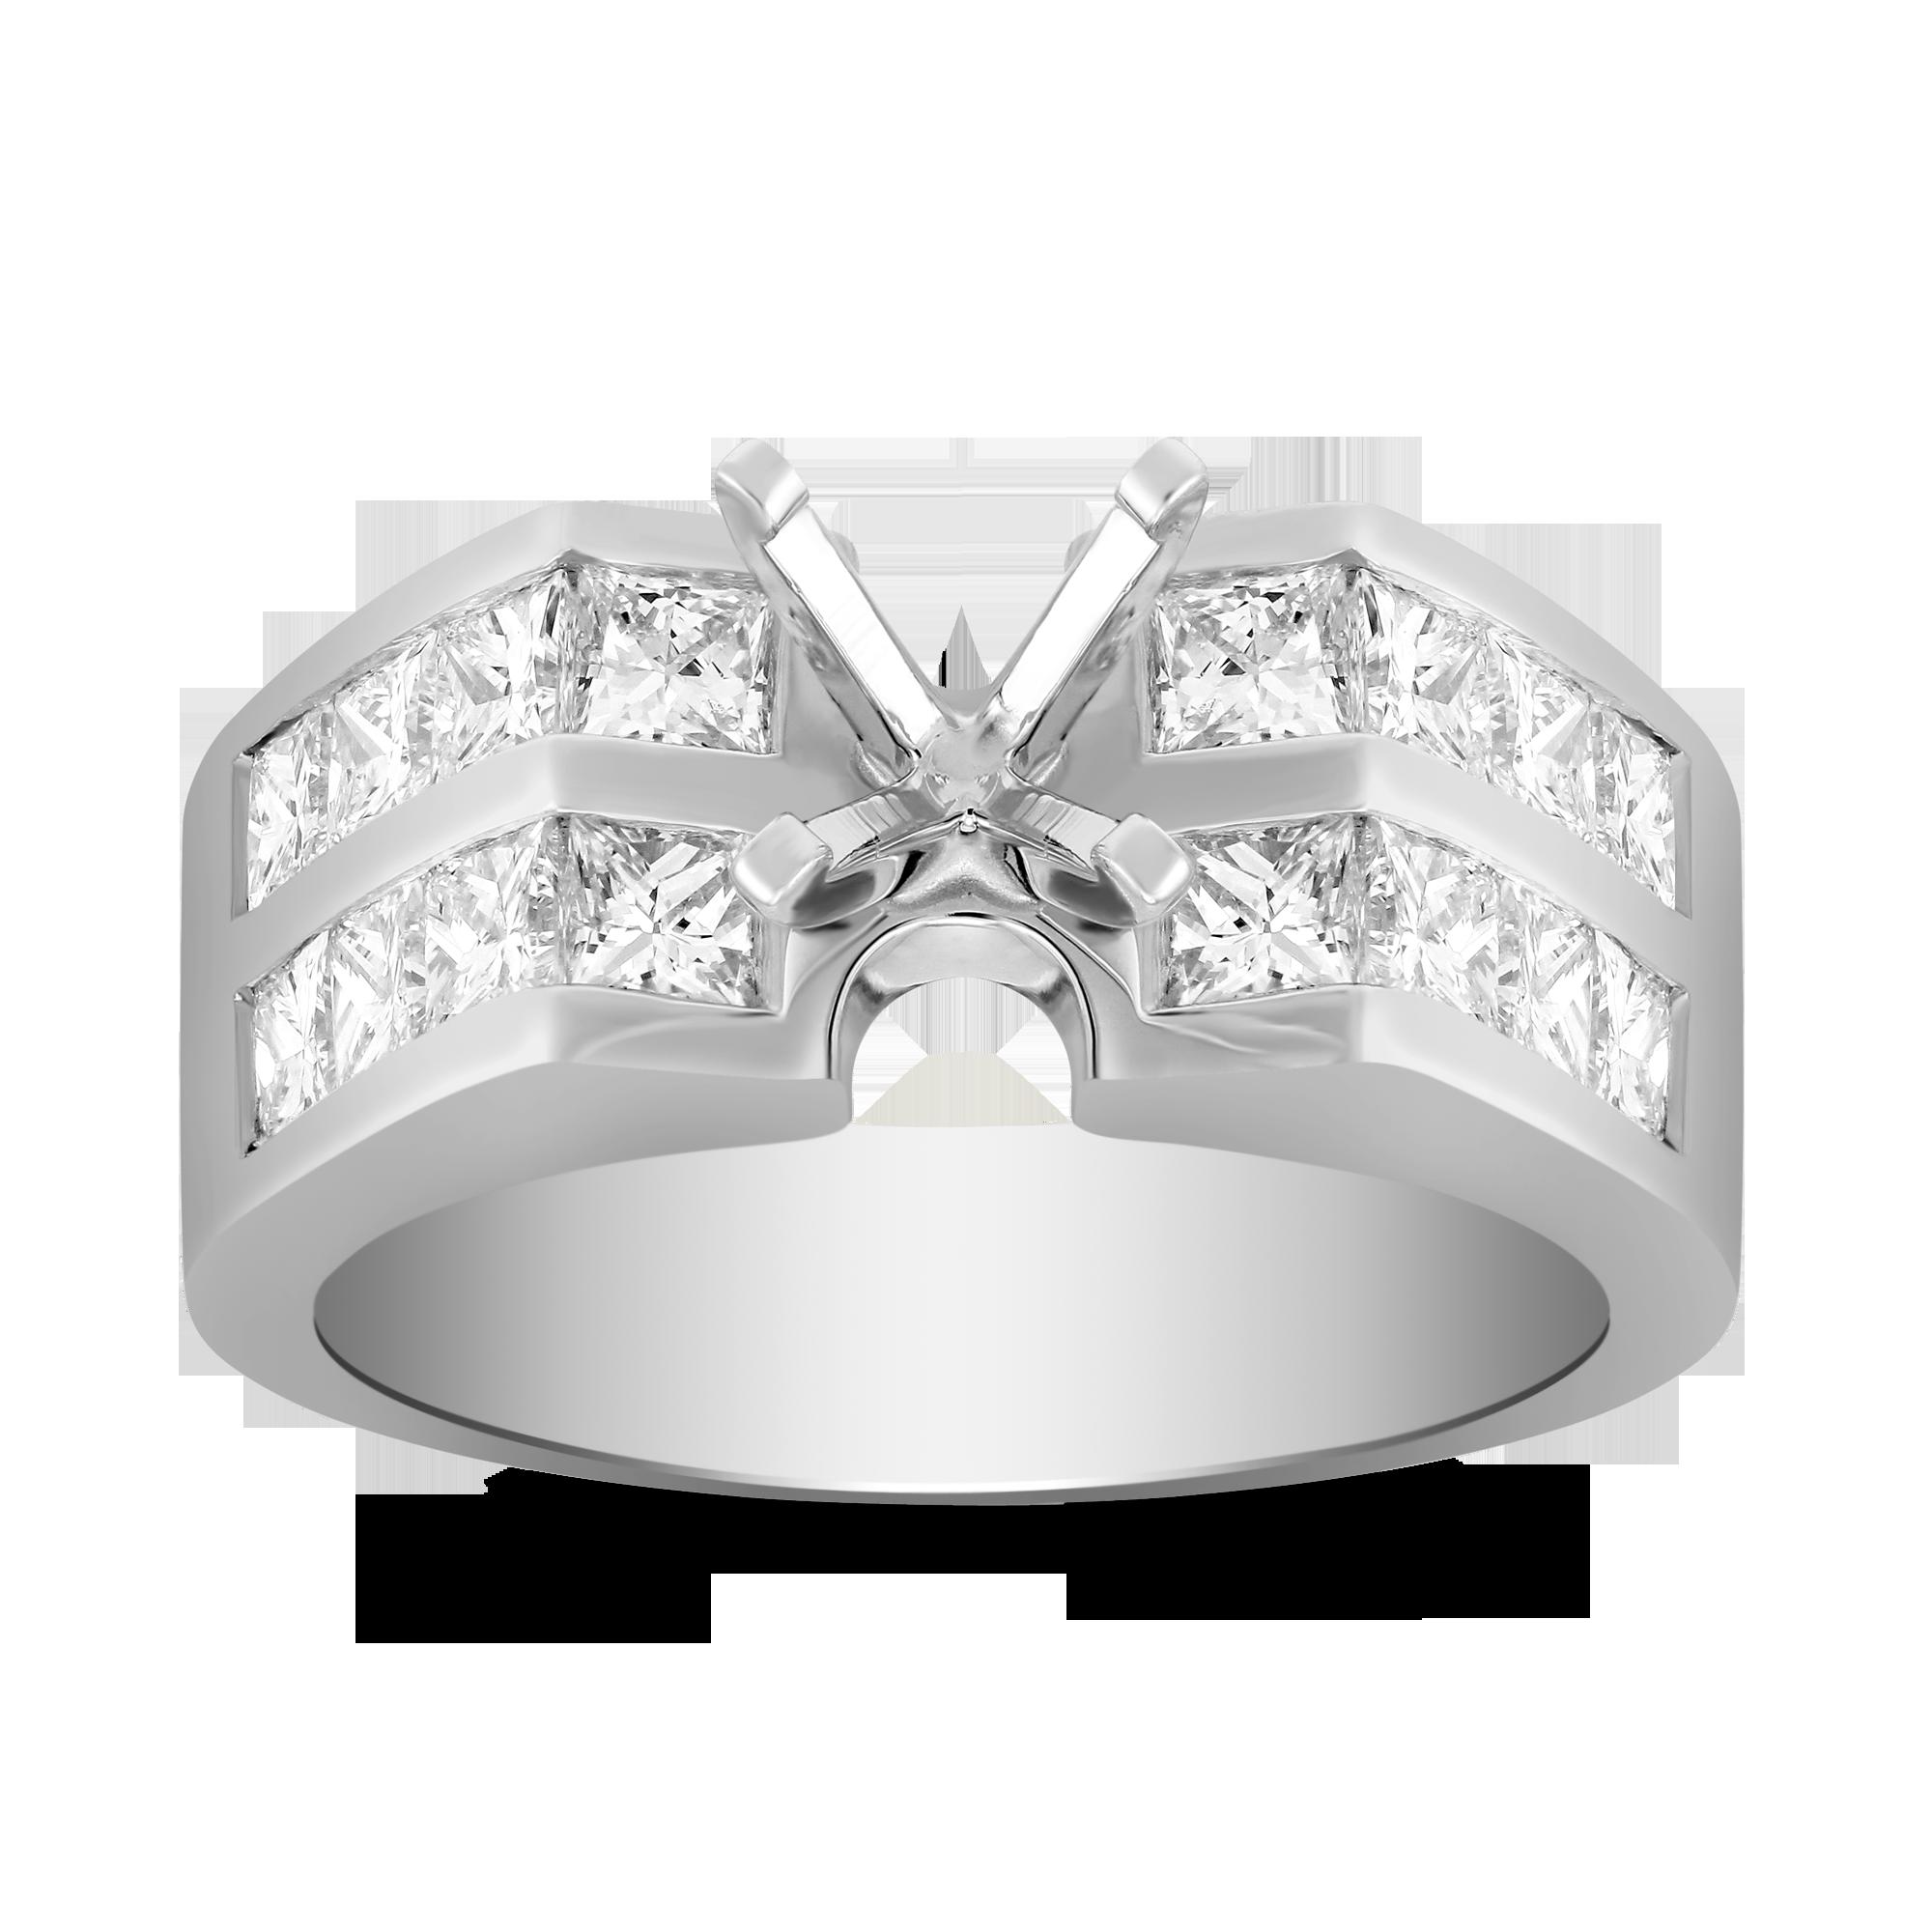 14k White Gold Double Channel Set Princess Cut Diamond Ring Mounting